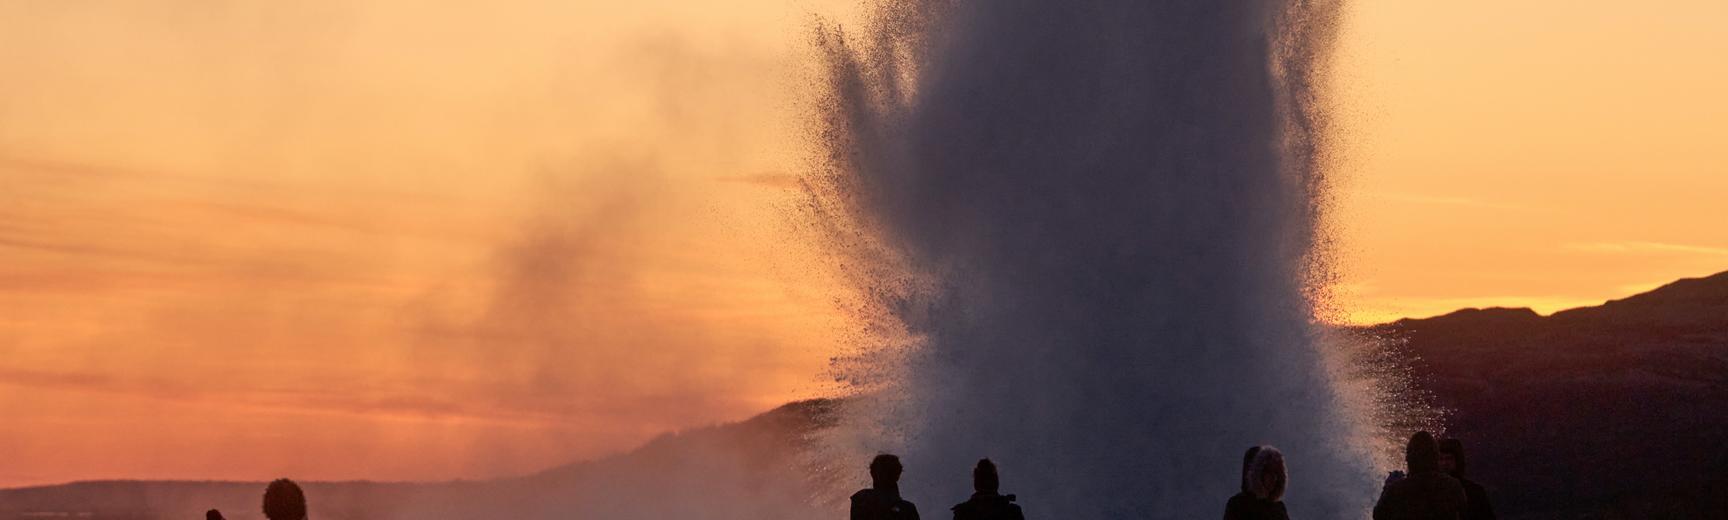 Exploding geyser in Iceland